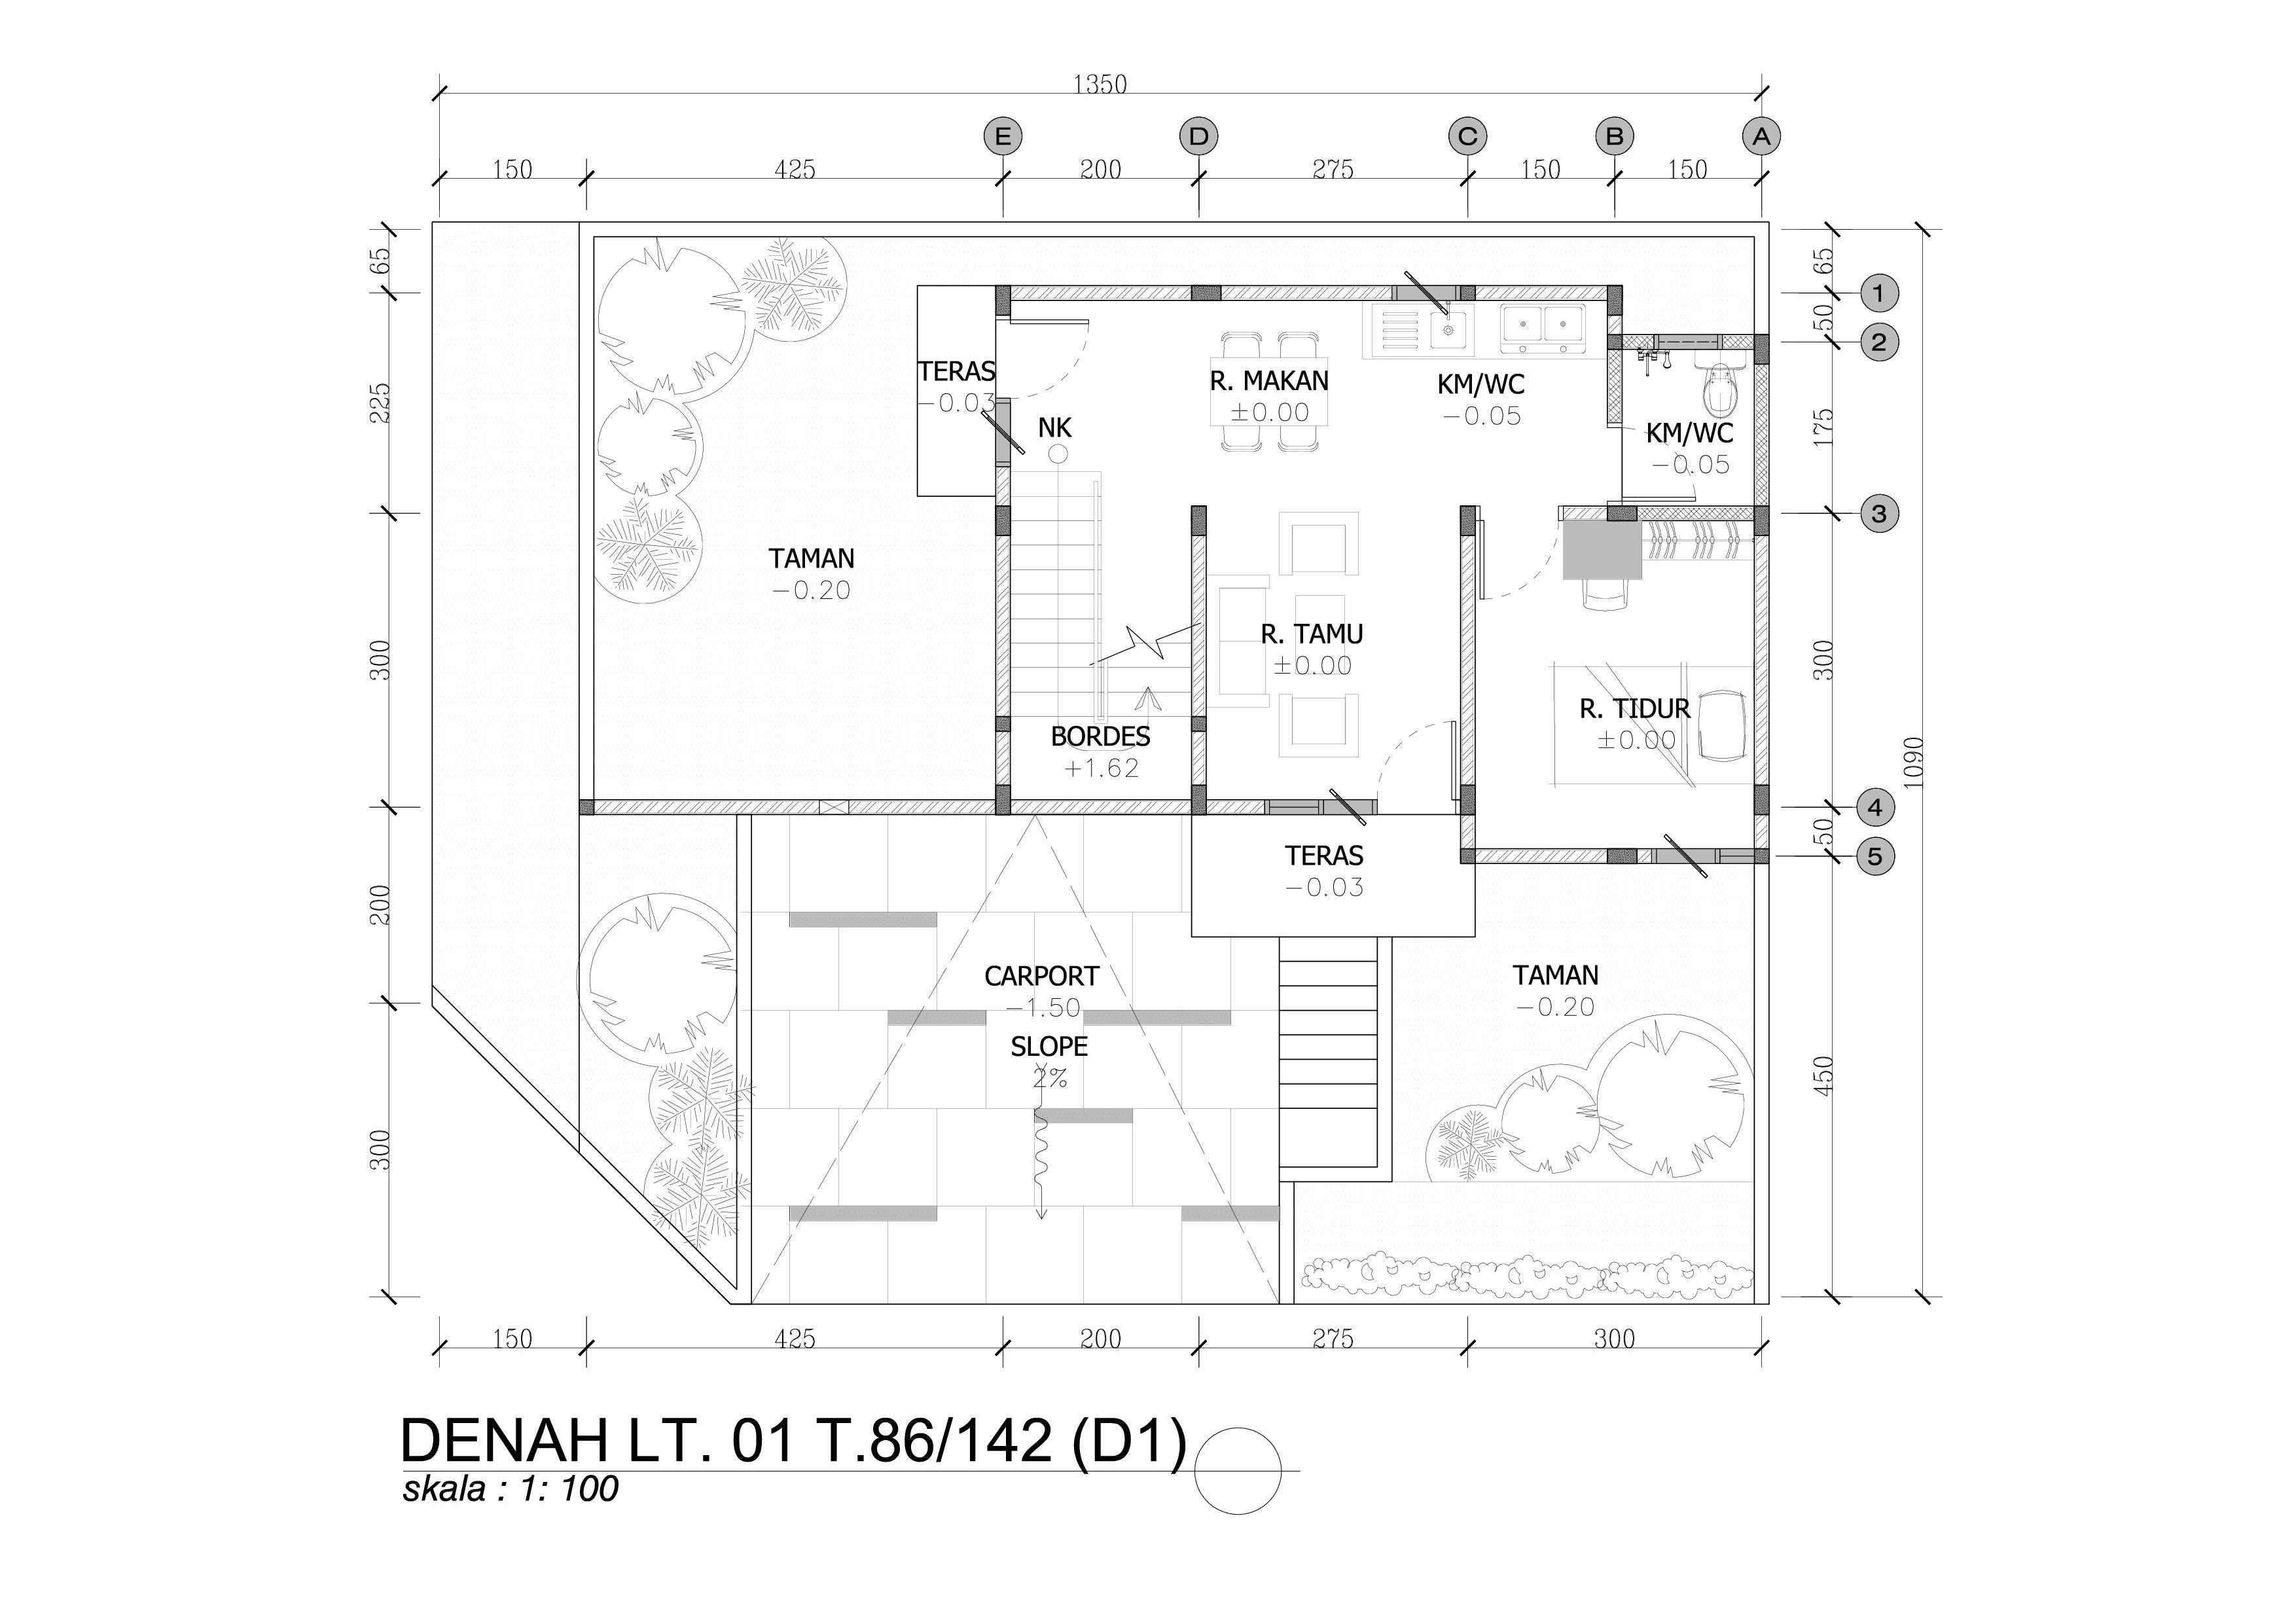 DENAH T.86 LT 01 (D1) HOOK